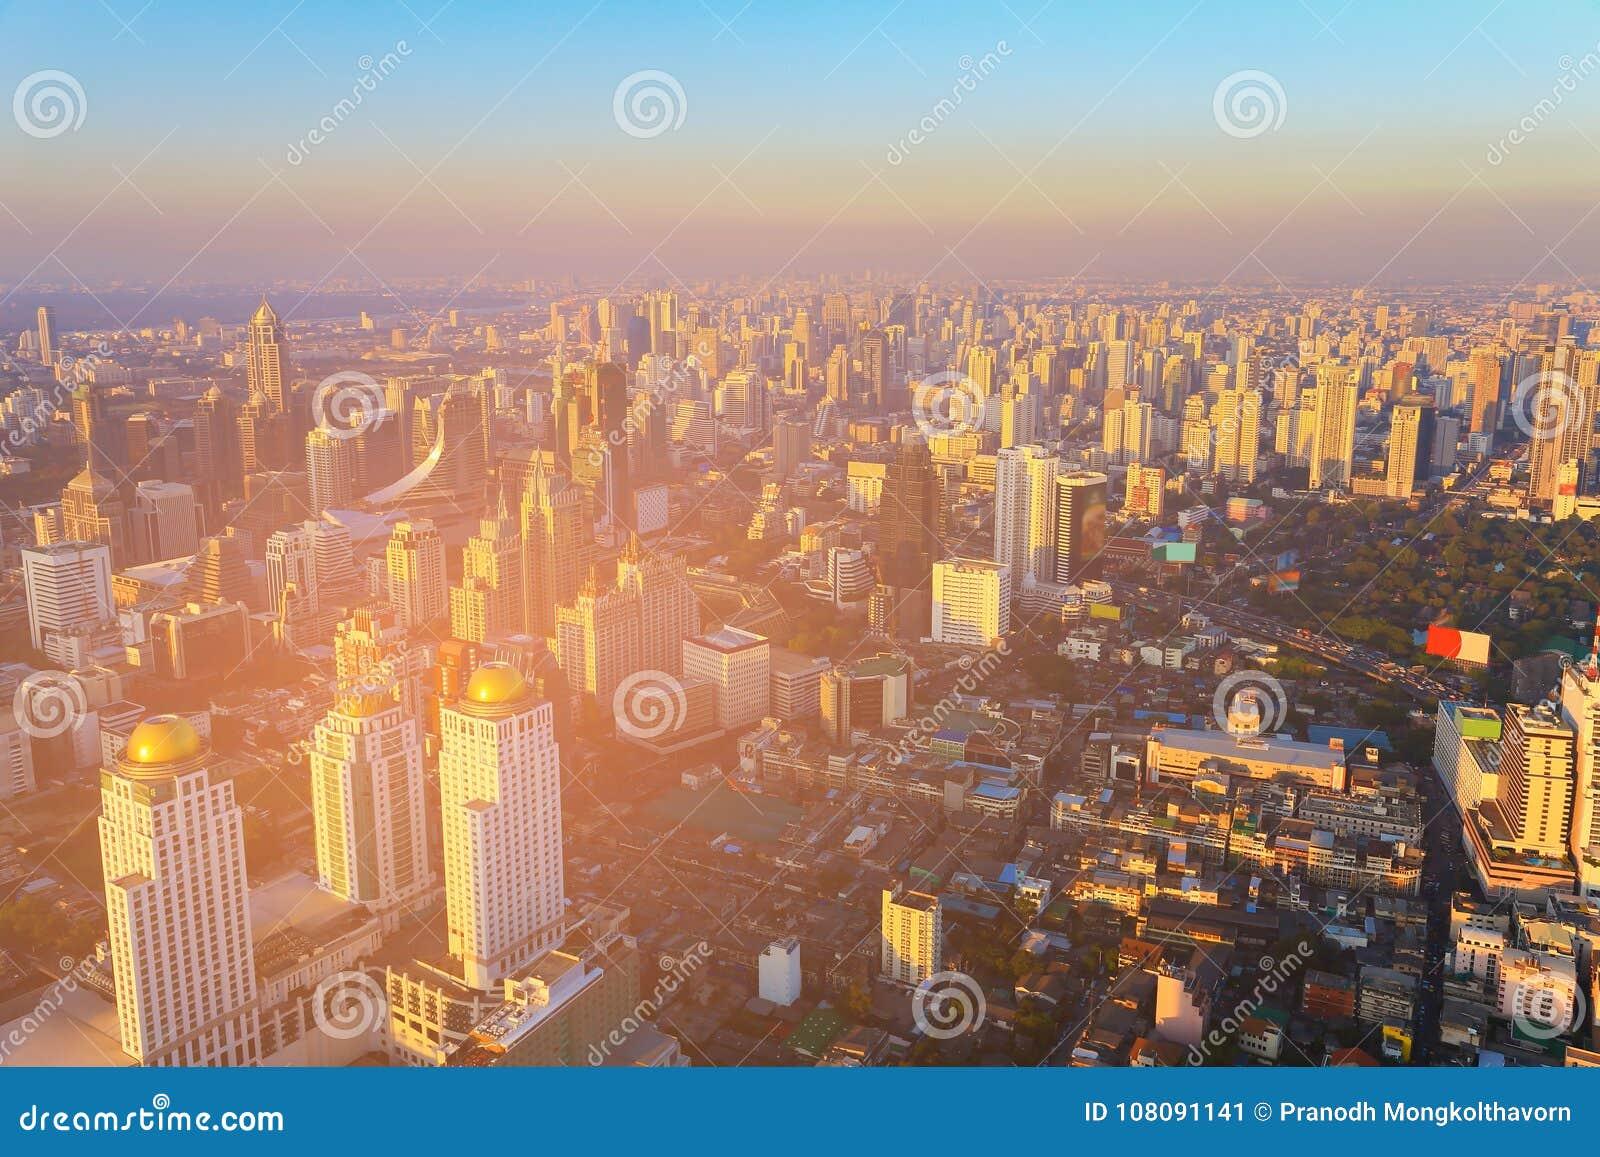 City building downtown skyline